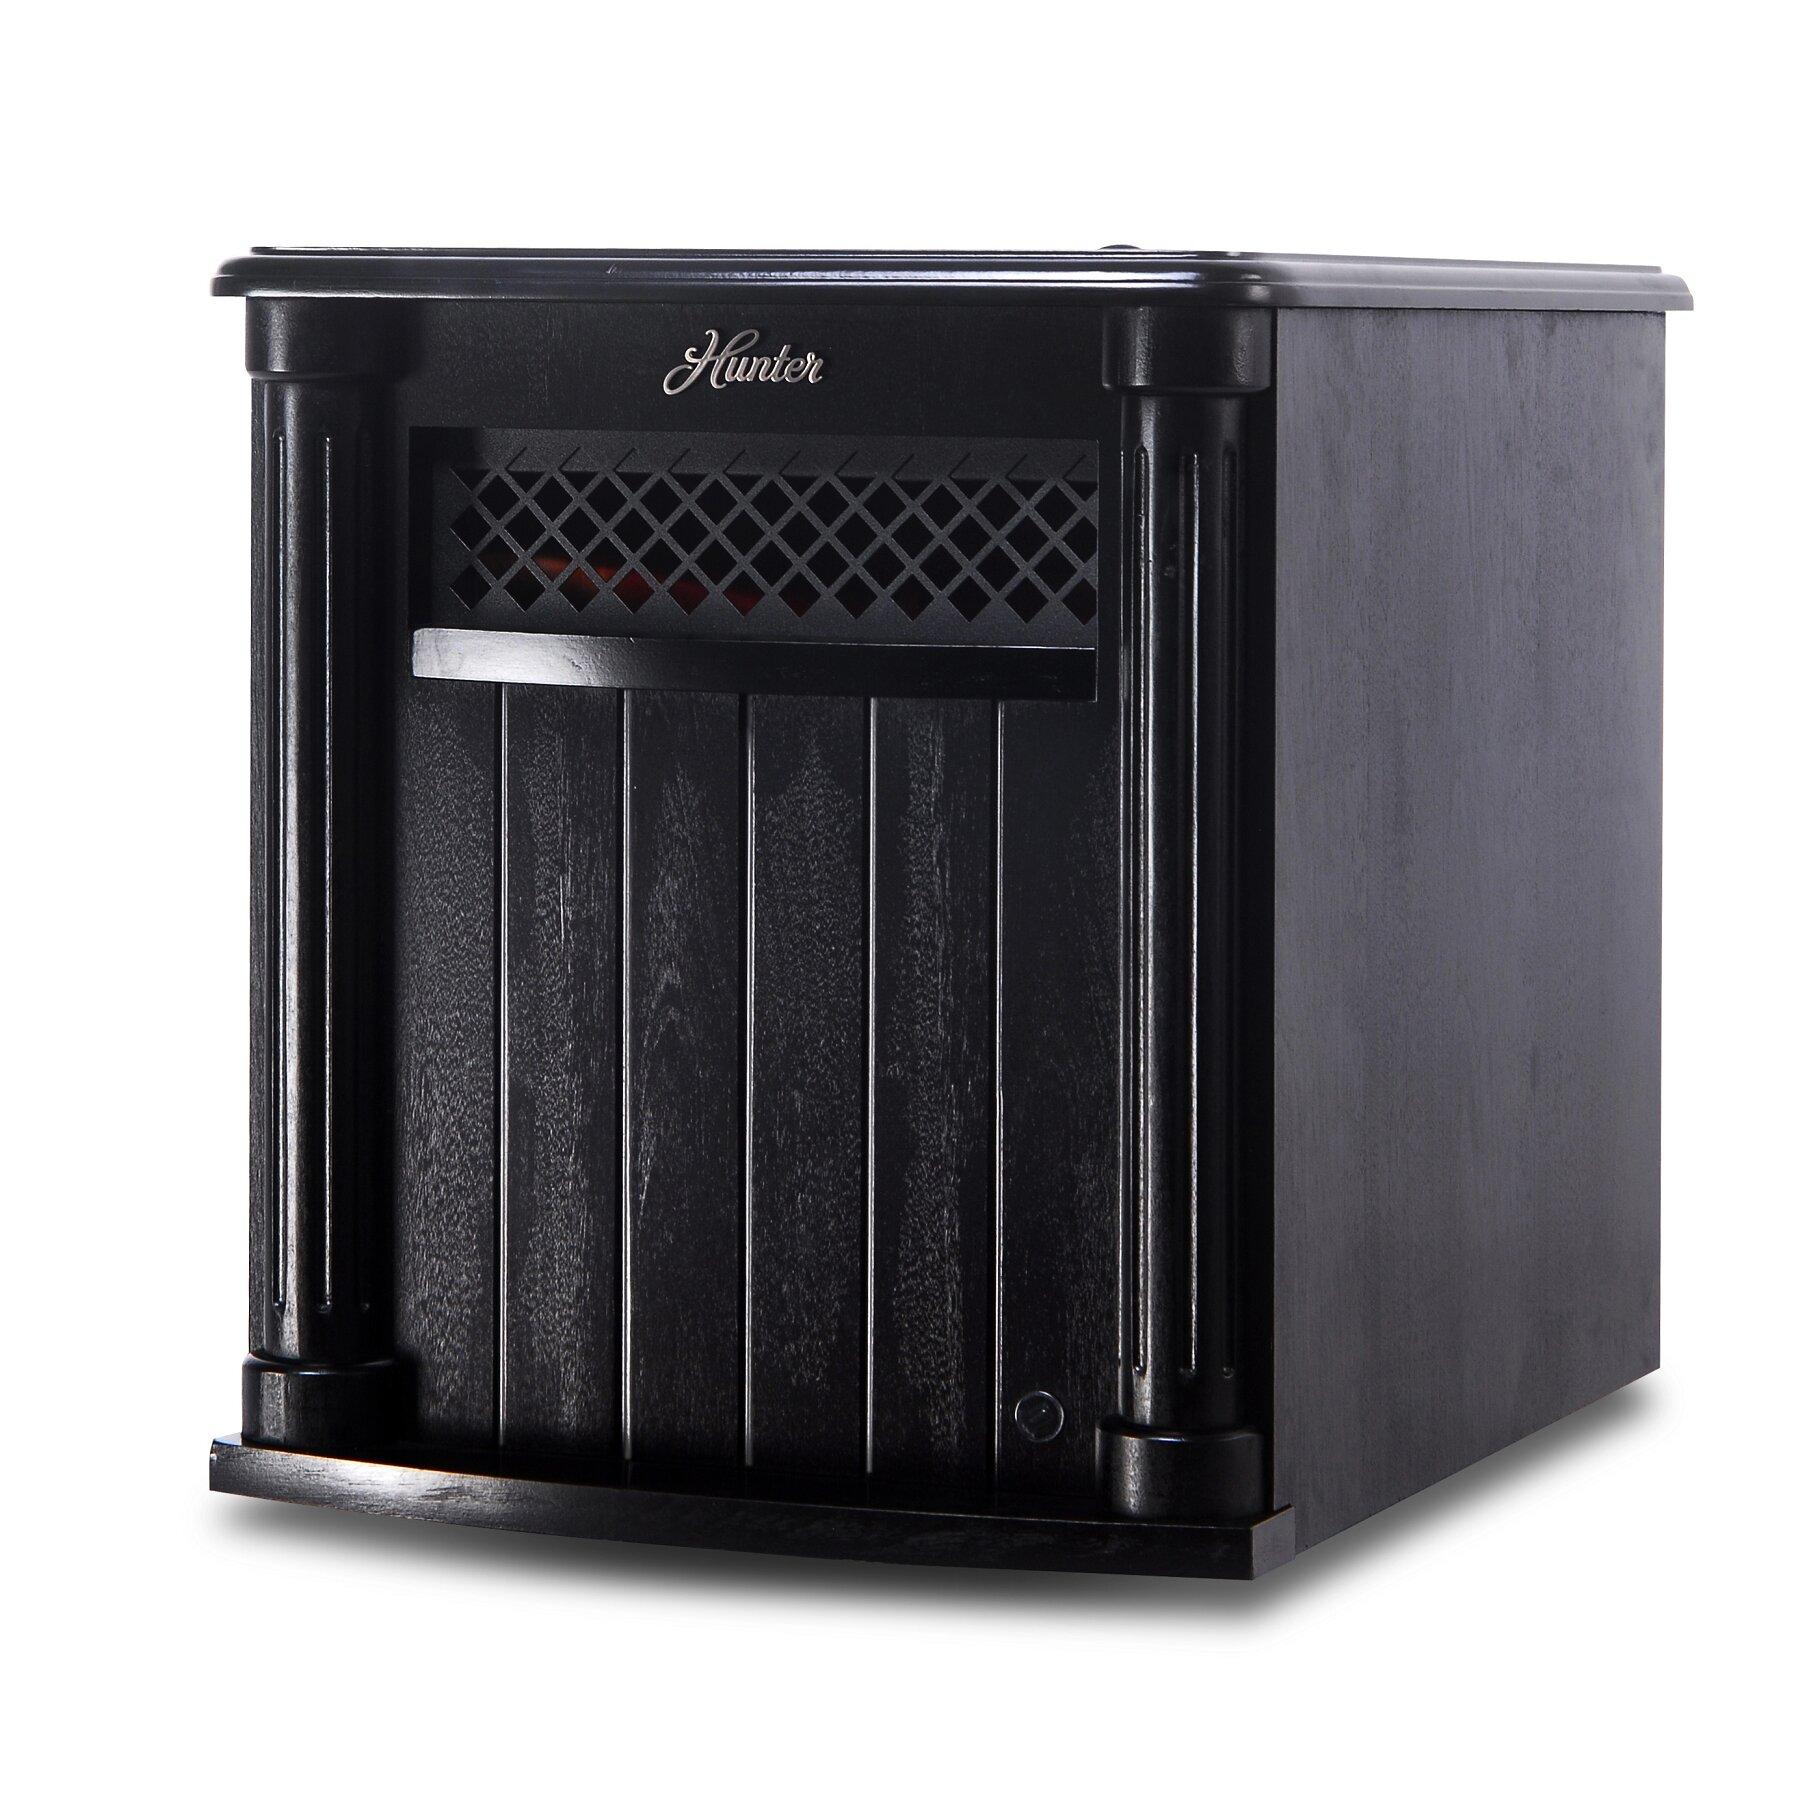 Hunter Home Comfort 1 500 Watt Portable Electric Infrared